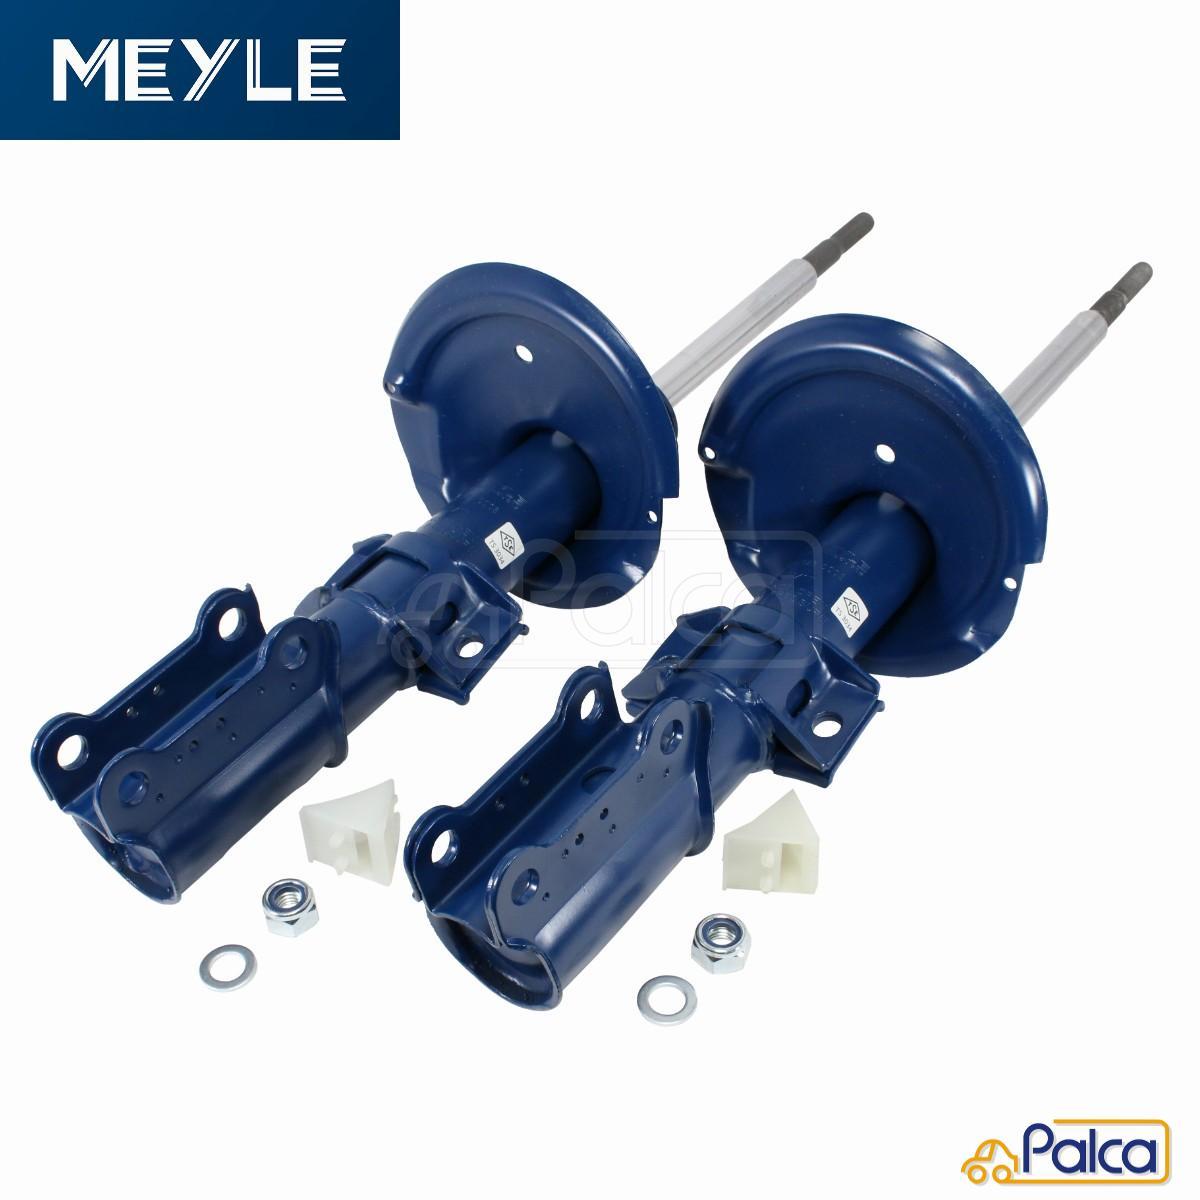 MEYLE製 新品 あす楽 ボルボ VOLVO 永遠の定番モデル フロント 8646932 V70II 左右セット 購買 ショックアブソーバー S60 S80